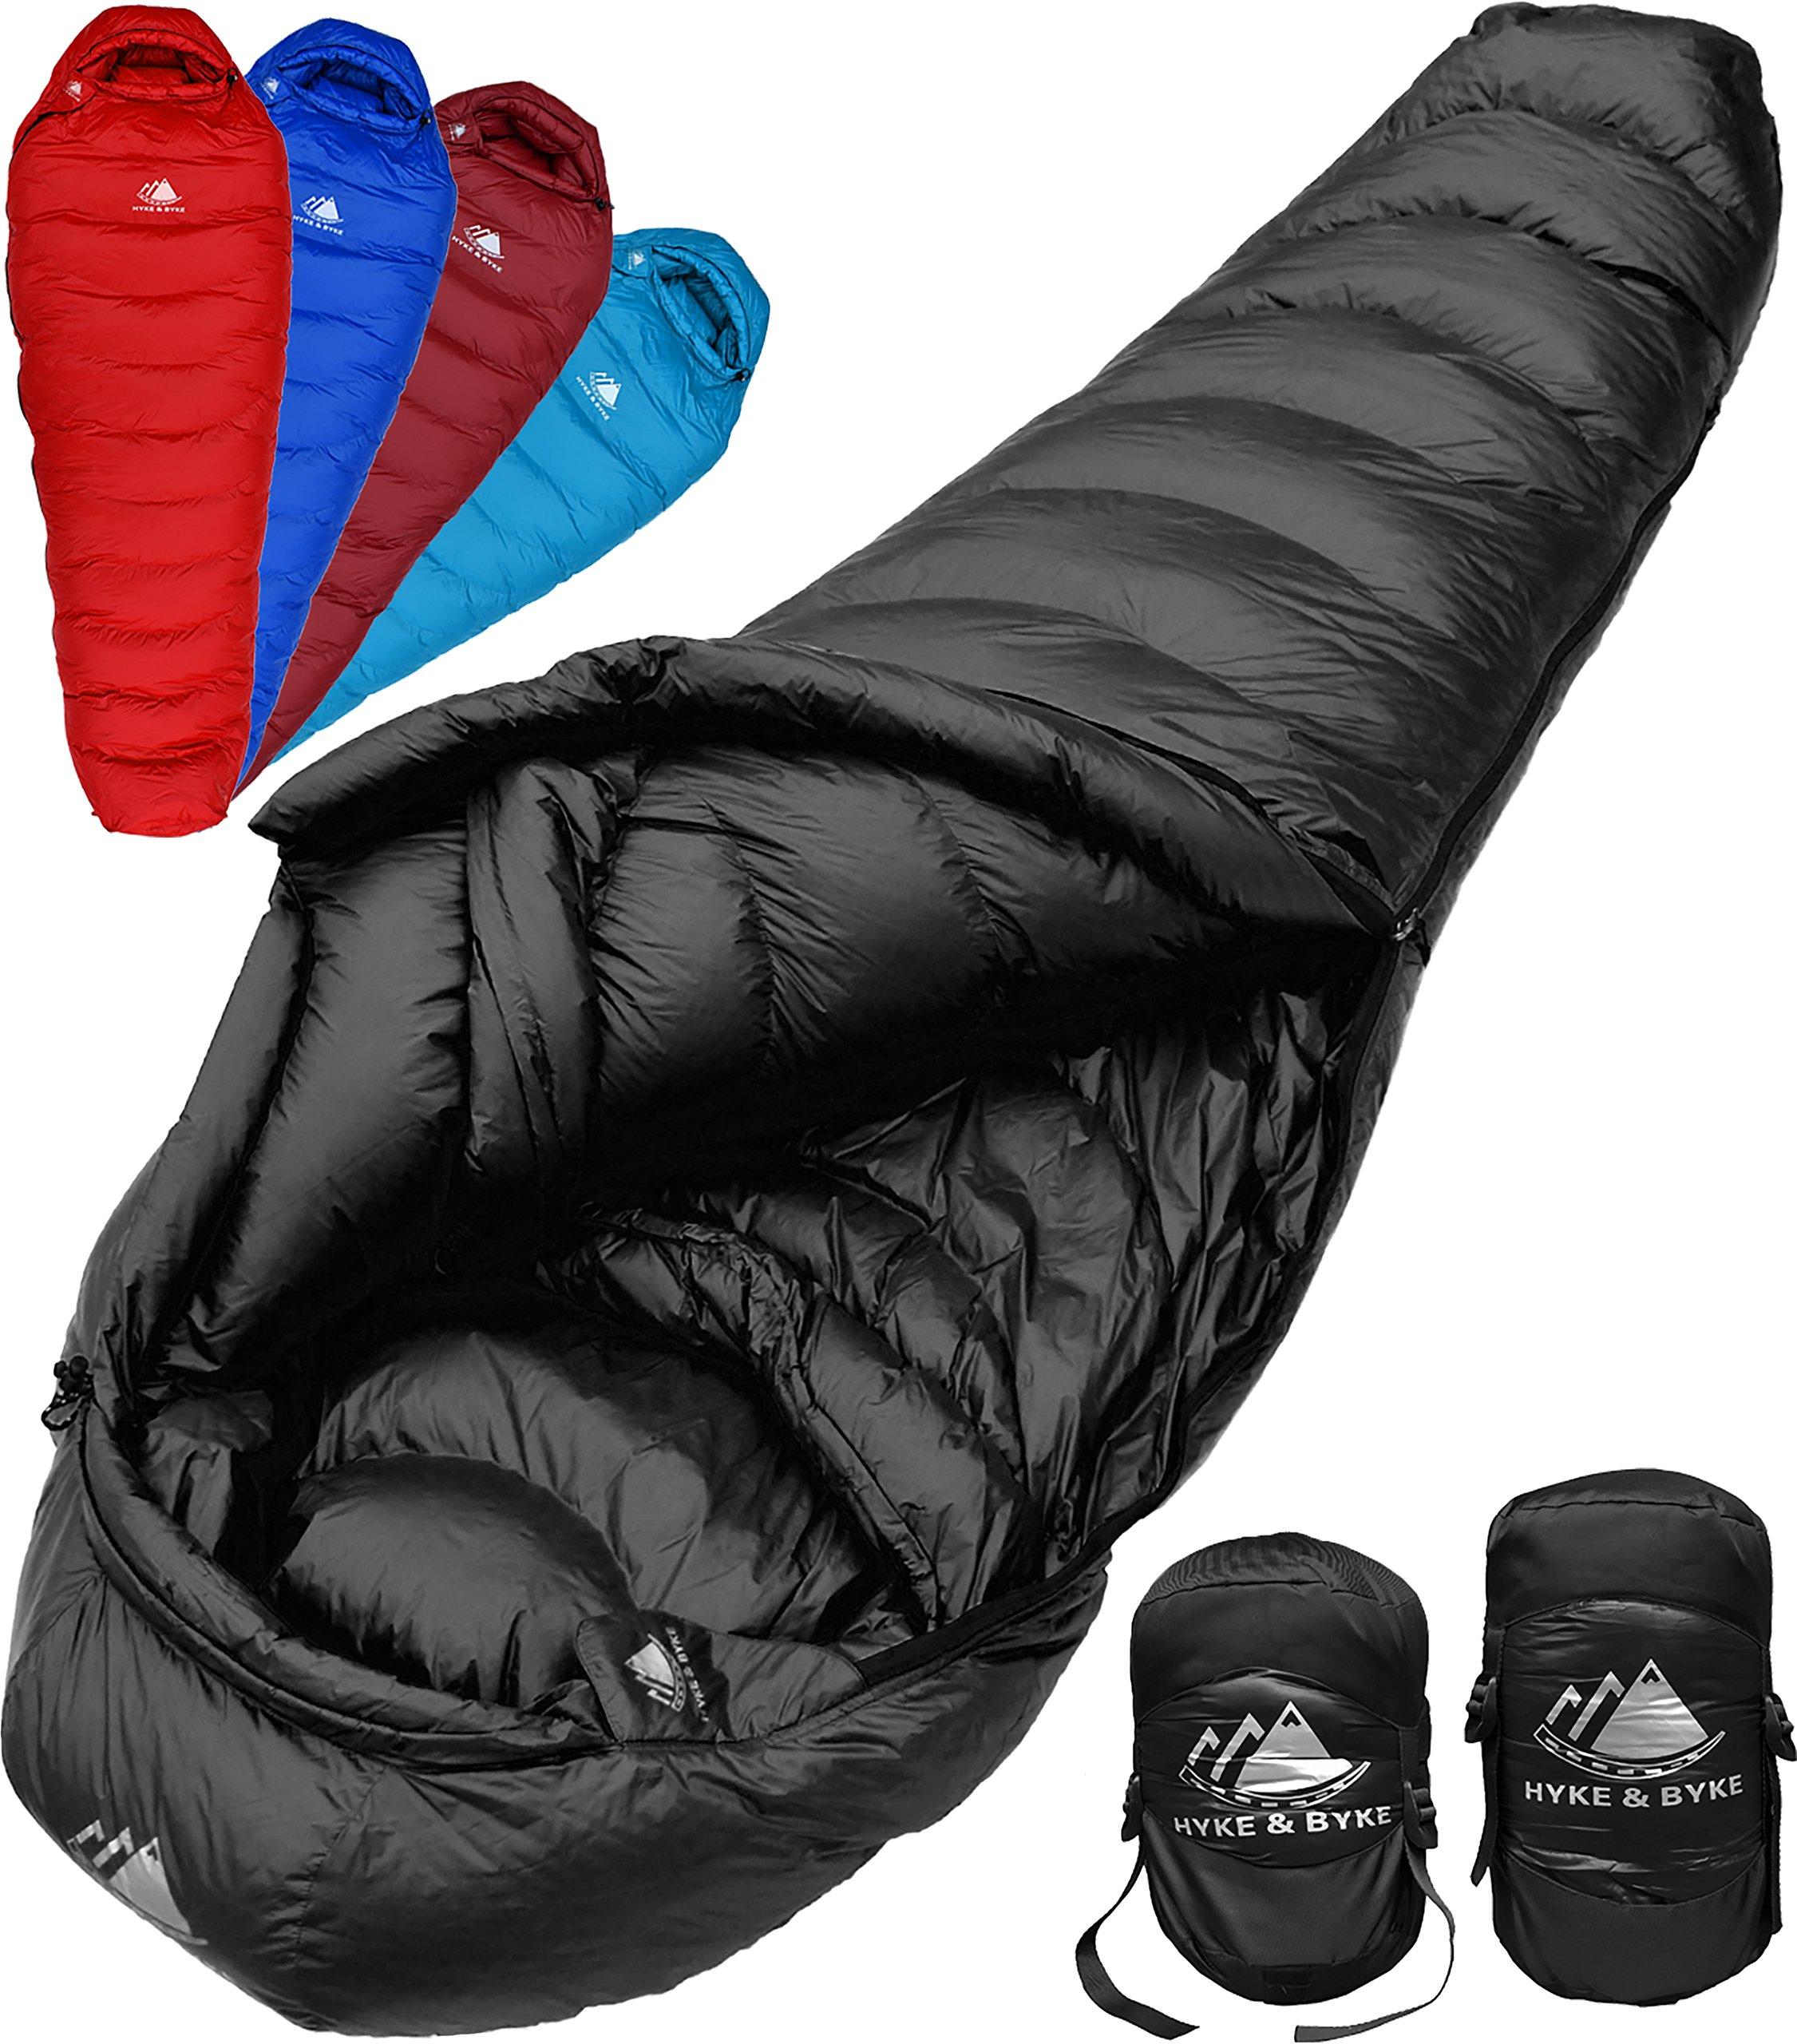 Hyke & Byke Quandary 15 Degree F 650 Fill Power Hydrophobic Down Sleeping Bag with ClusterLoft Base - Ultra Lightweight 3 Season Men's and Women's Mummy Bag Designed for Backpacking 3